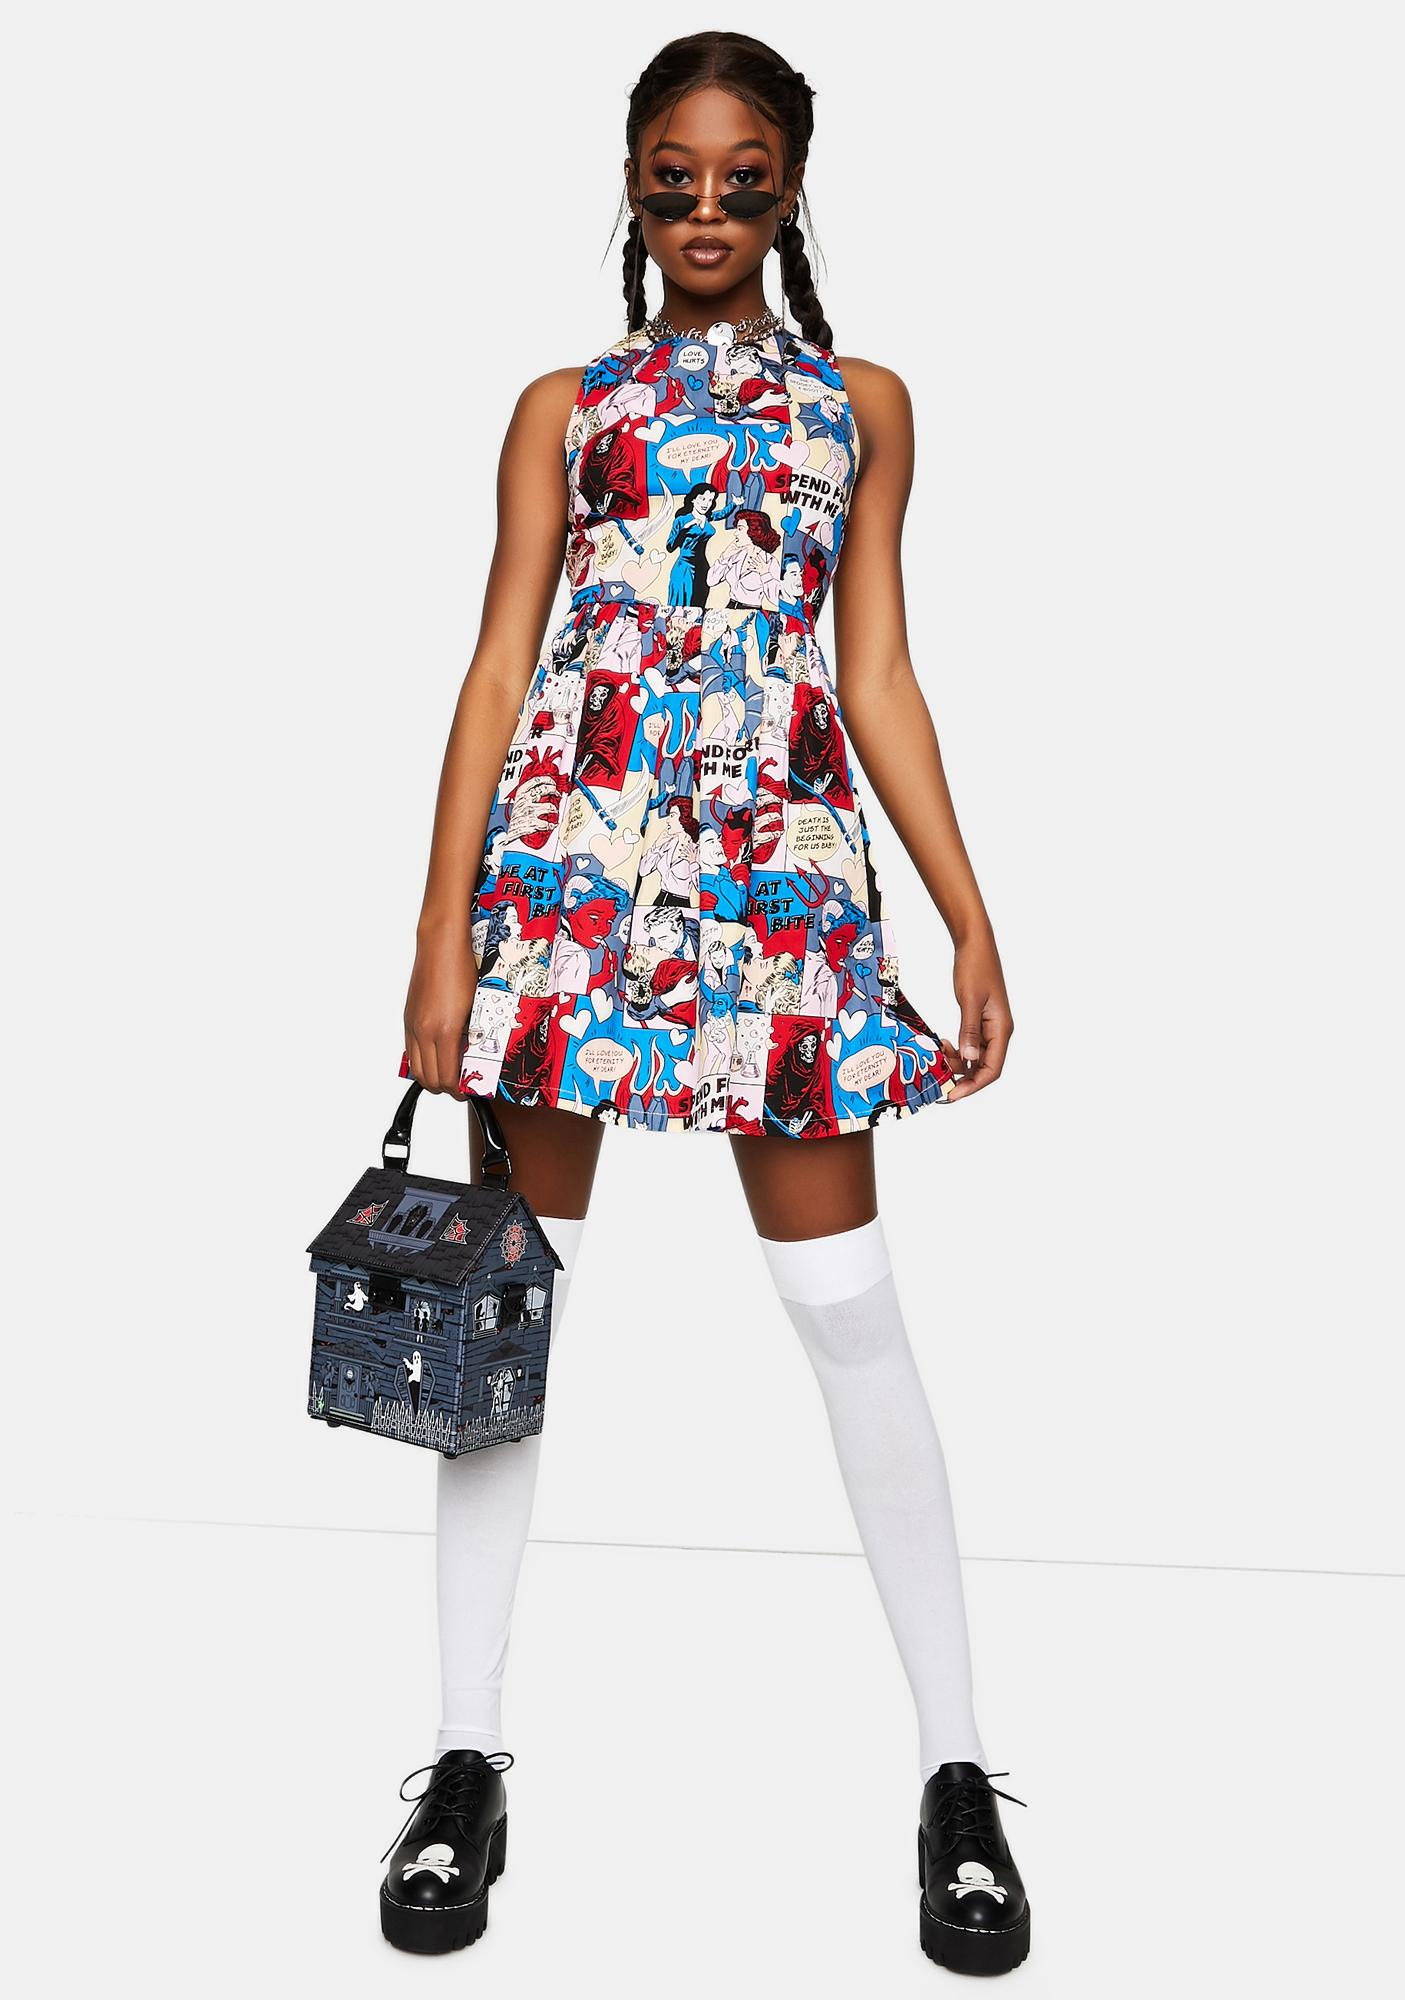 Black Friday Love At First Bite Mini Dress